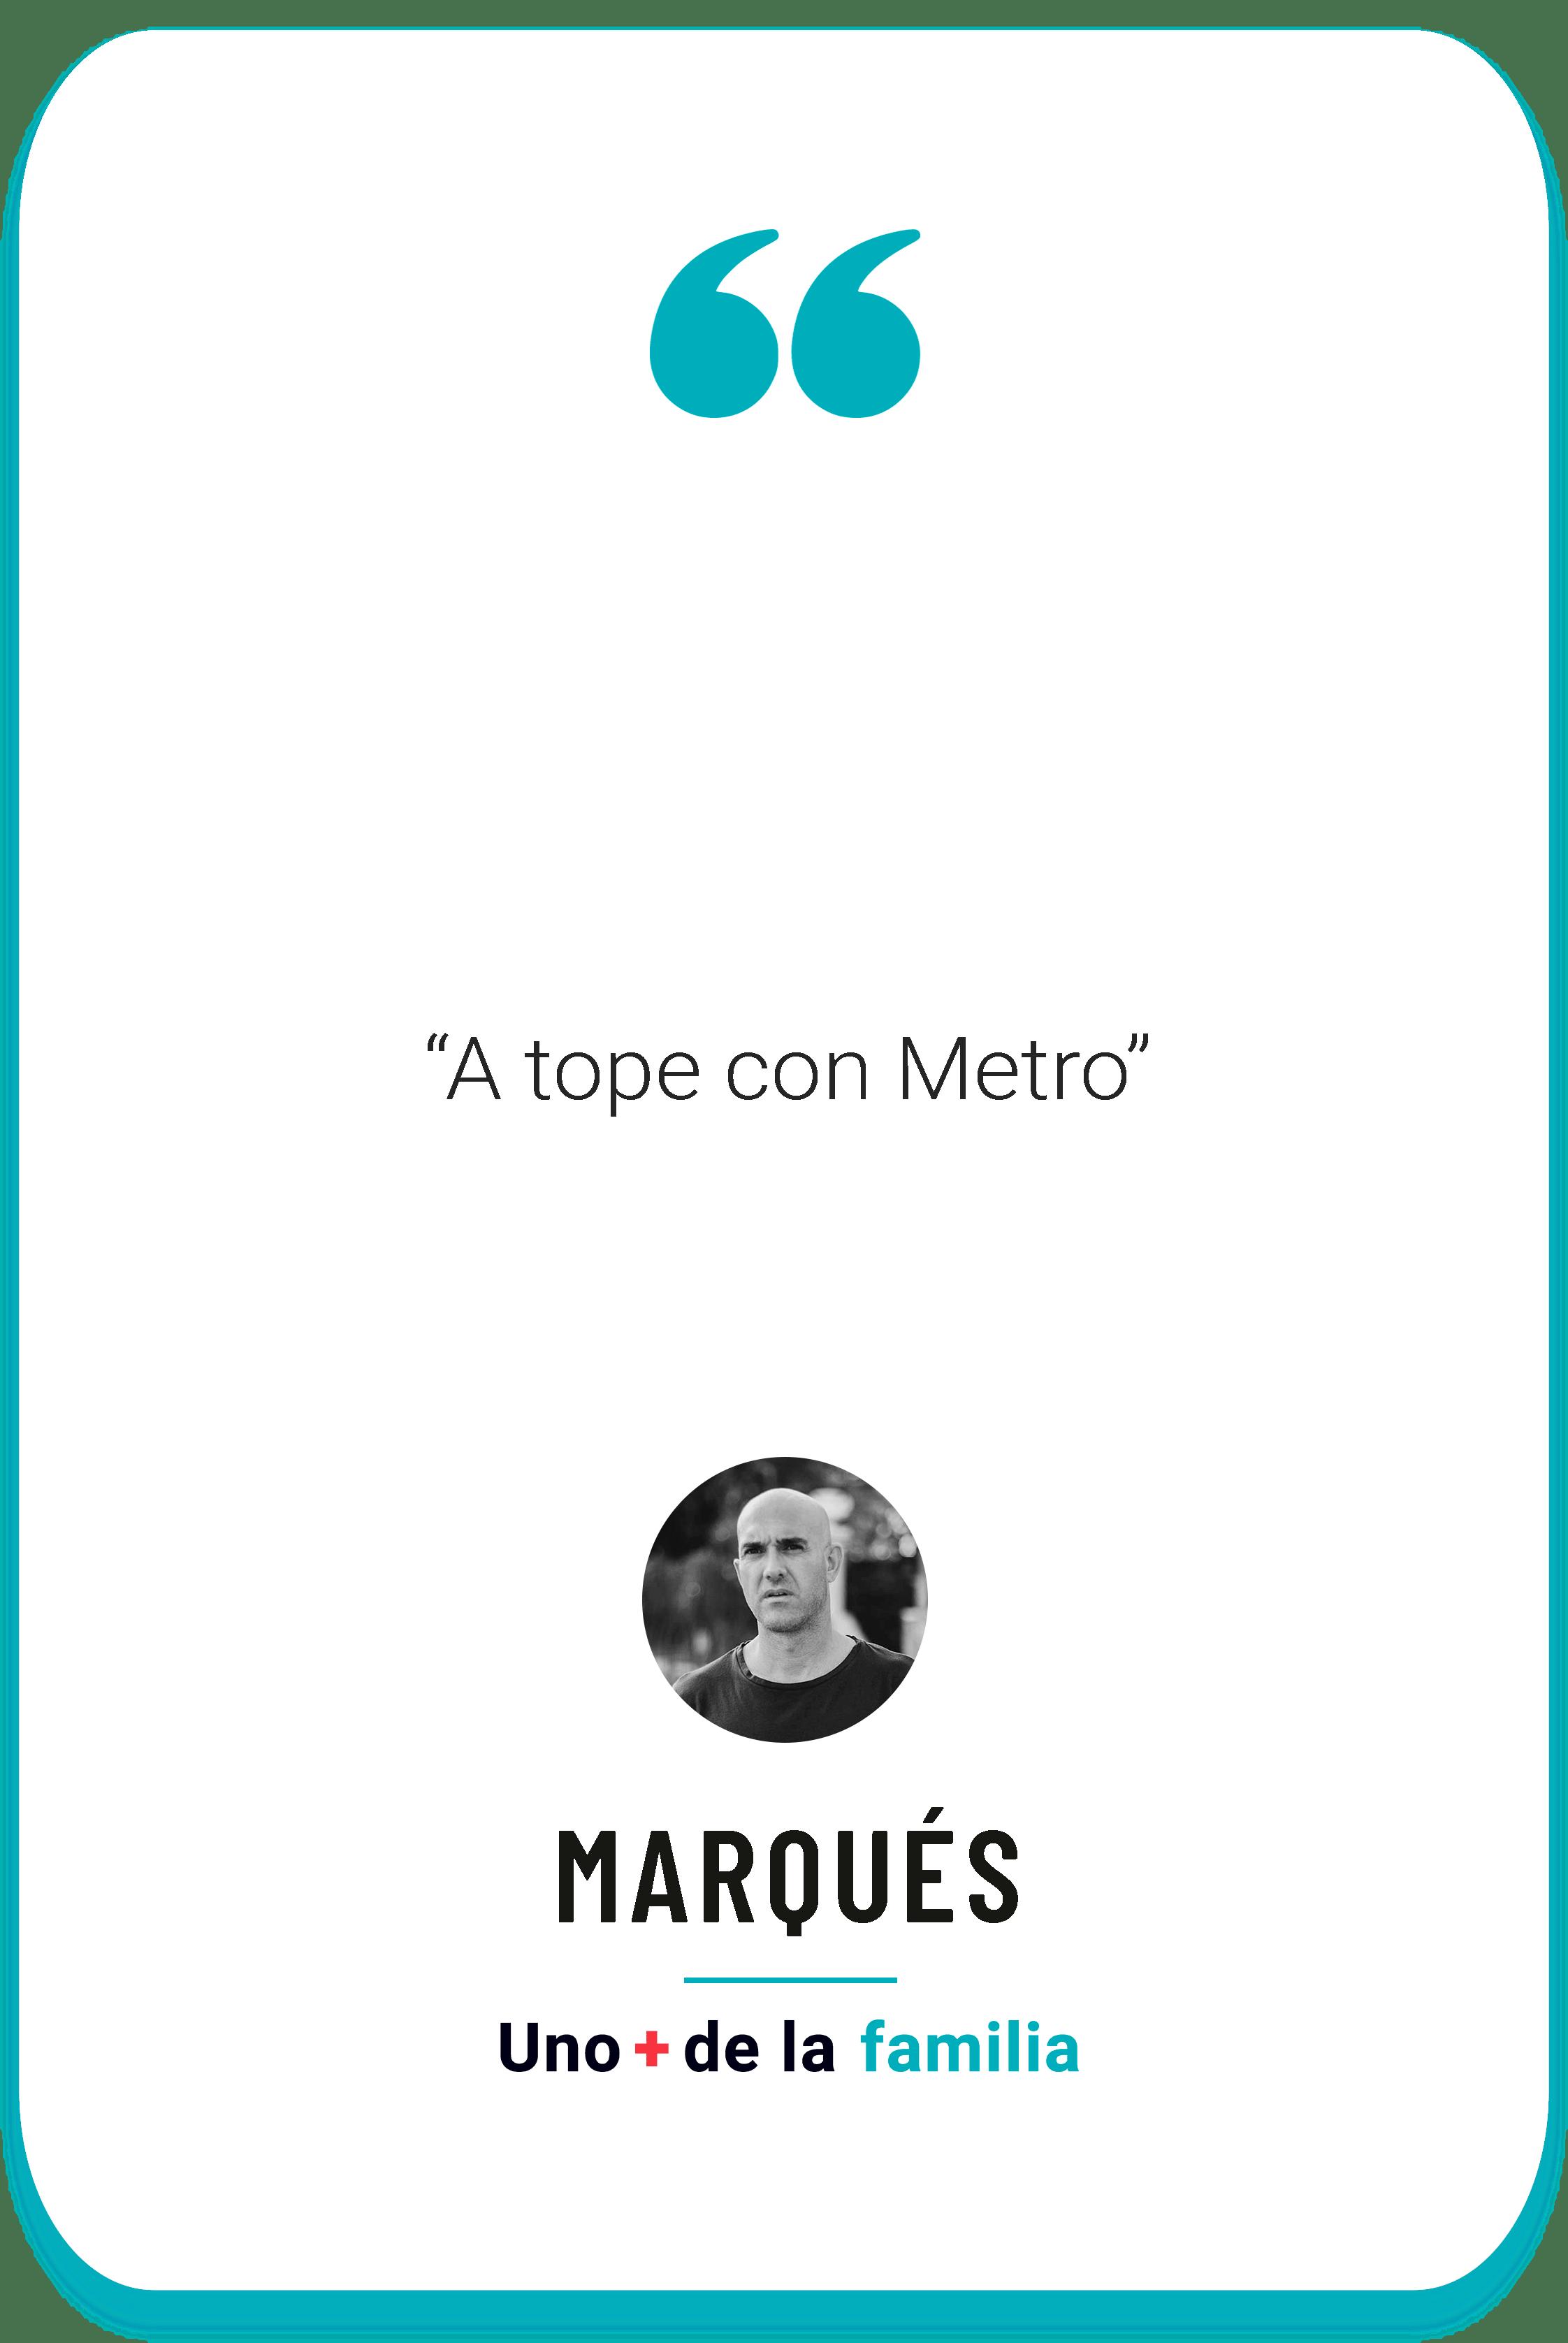 06_MARQUES-min